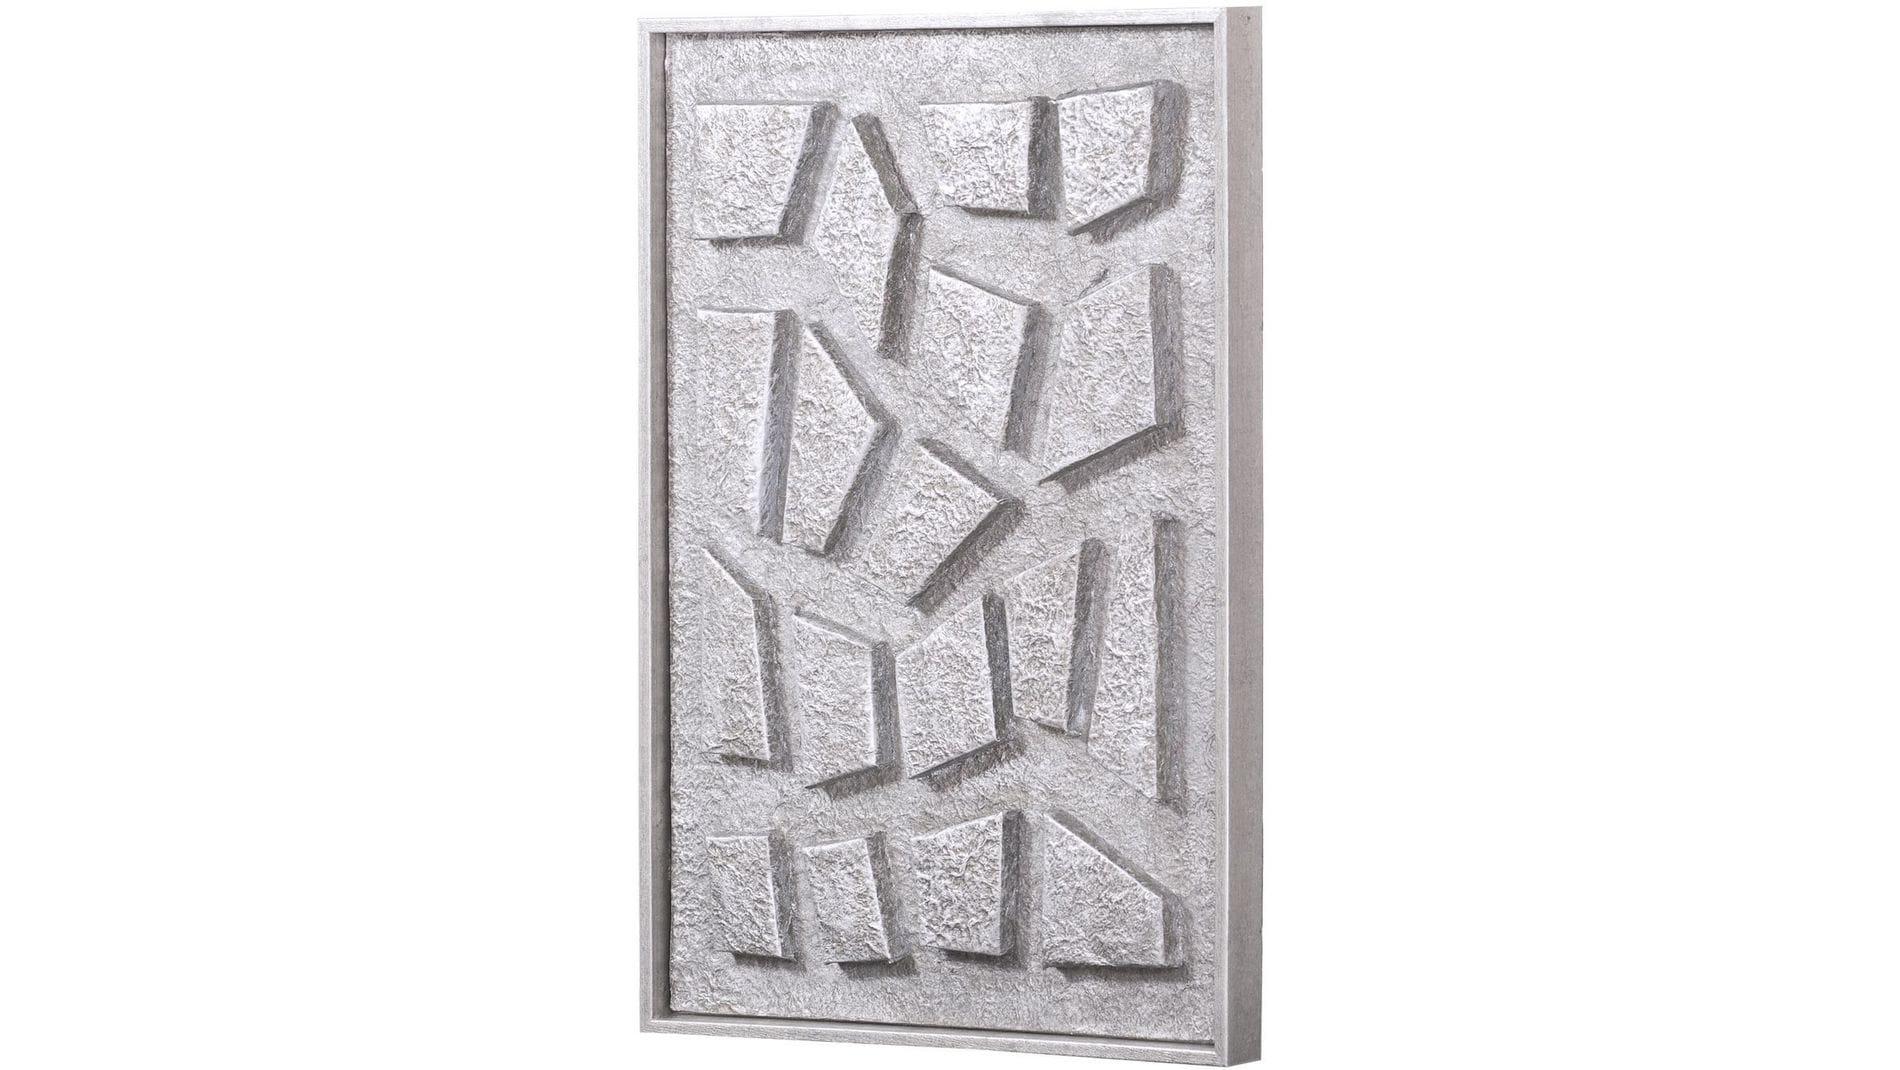 "Панно для декорирования стен "" Тетрис2 "" 40*60 см."